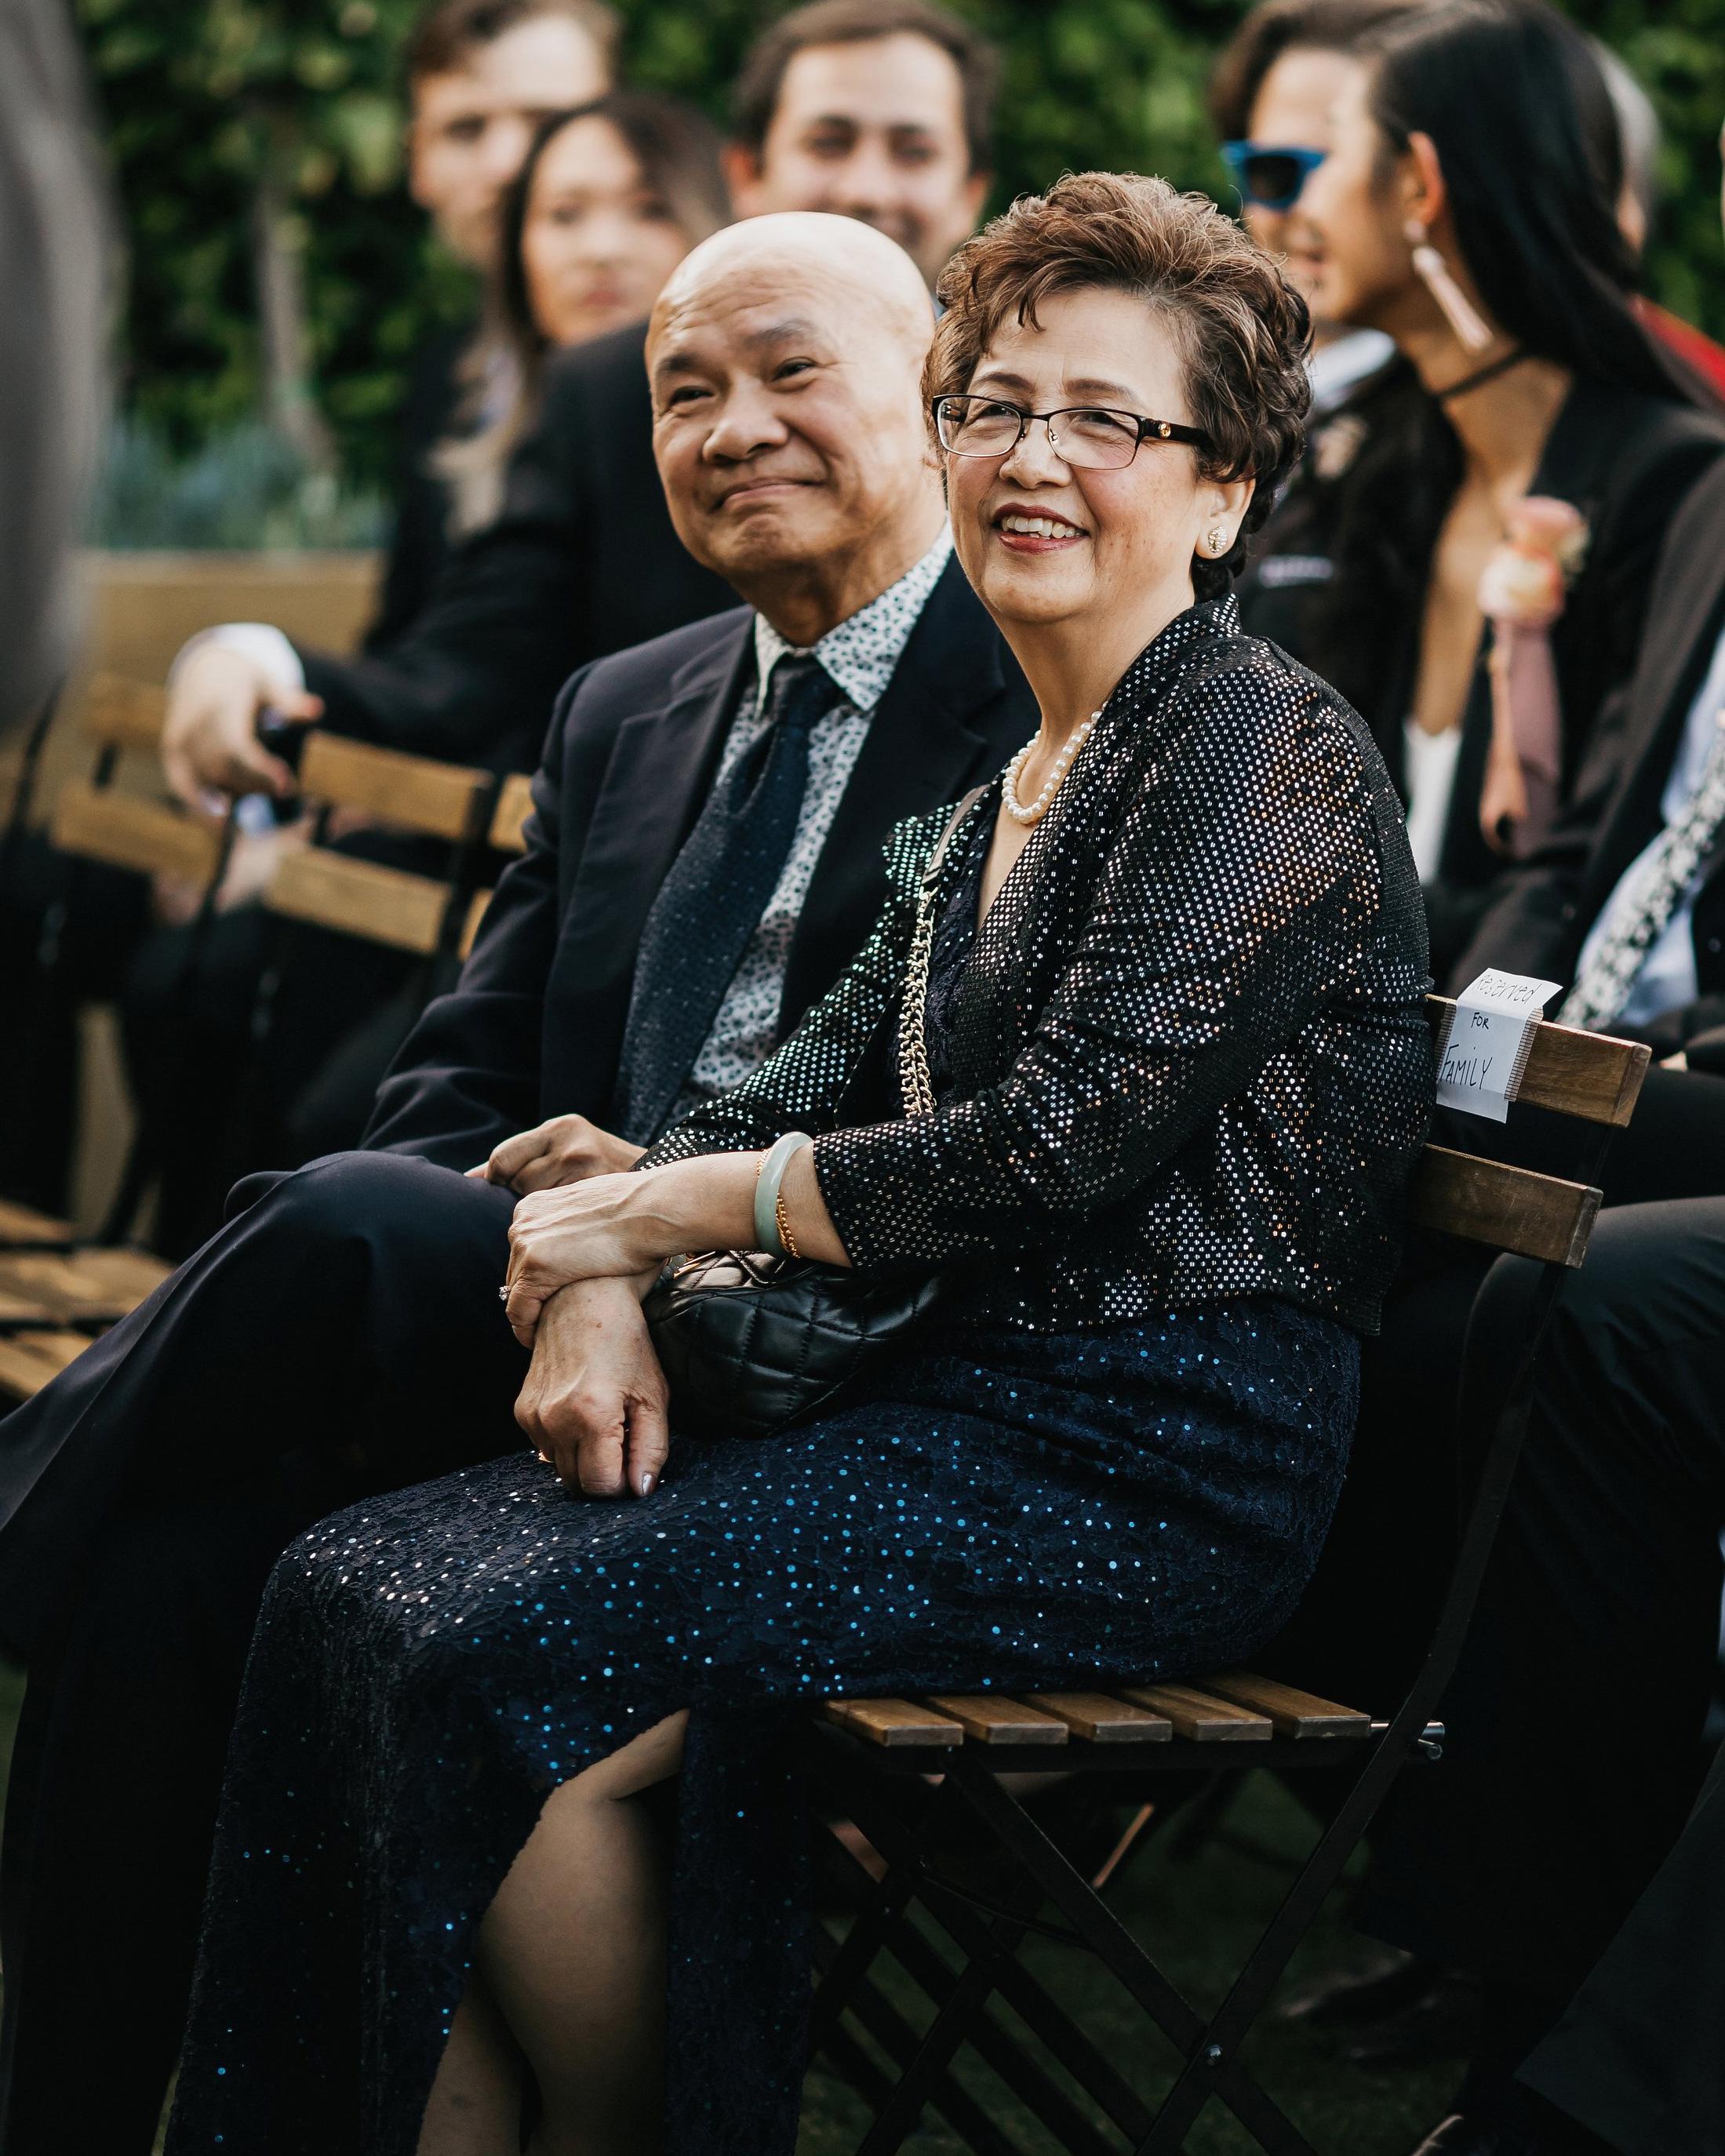 colleen pip wedding parents